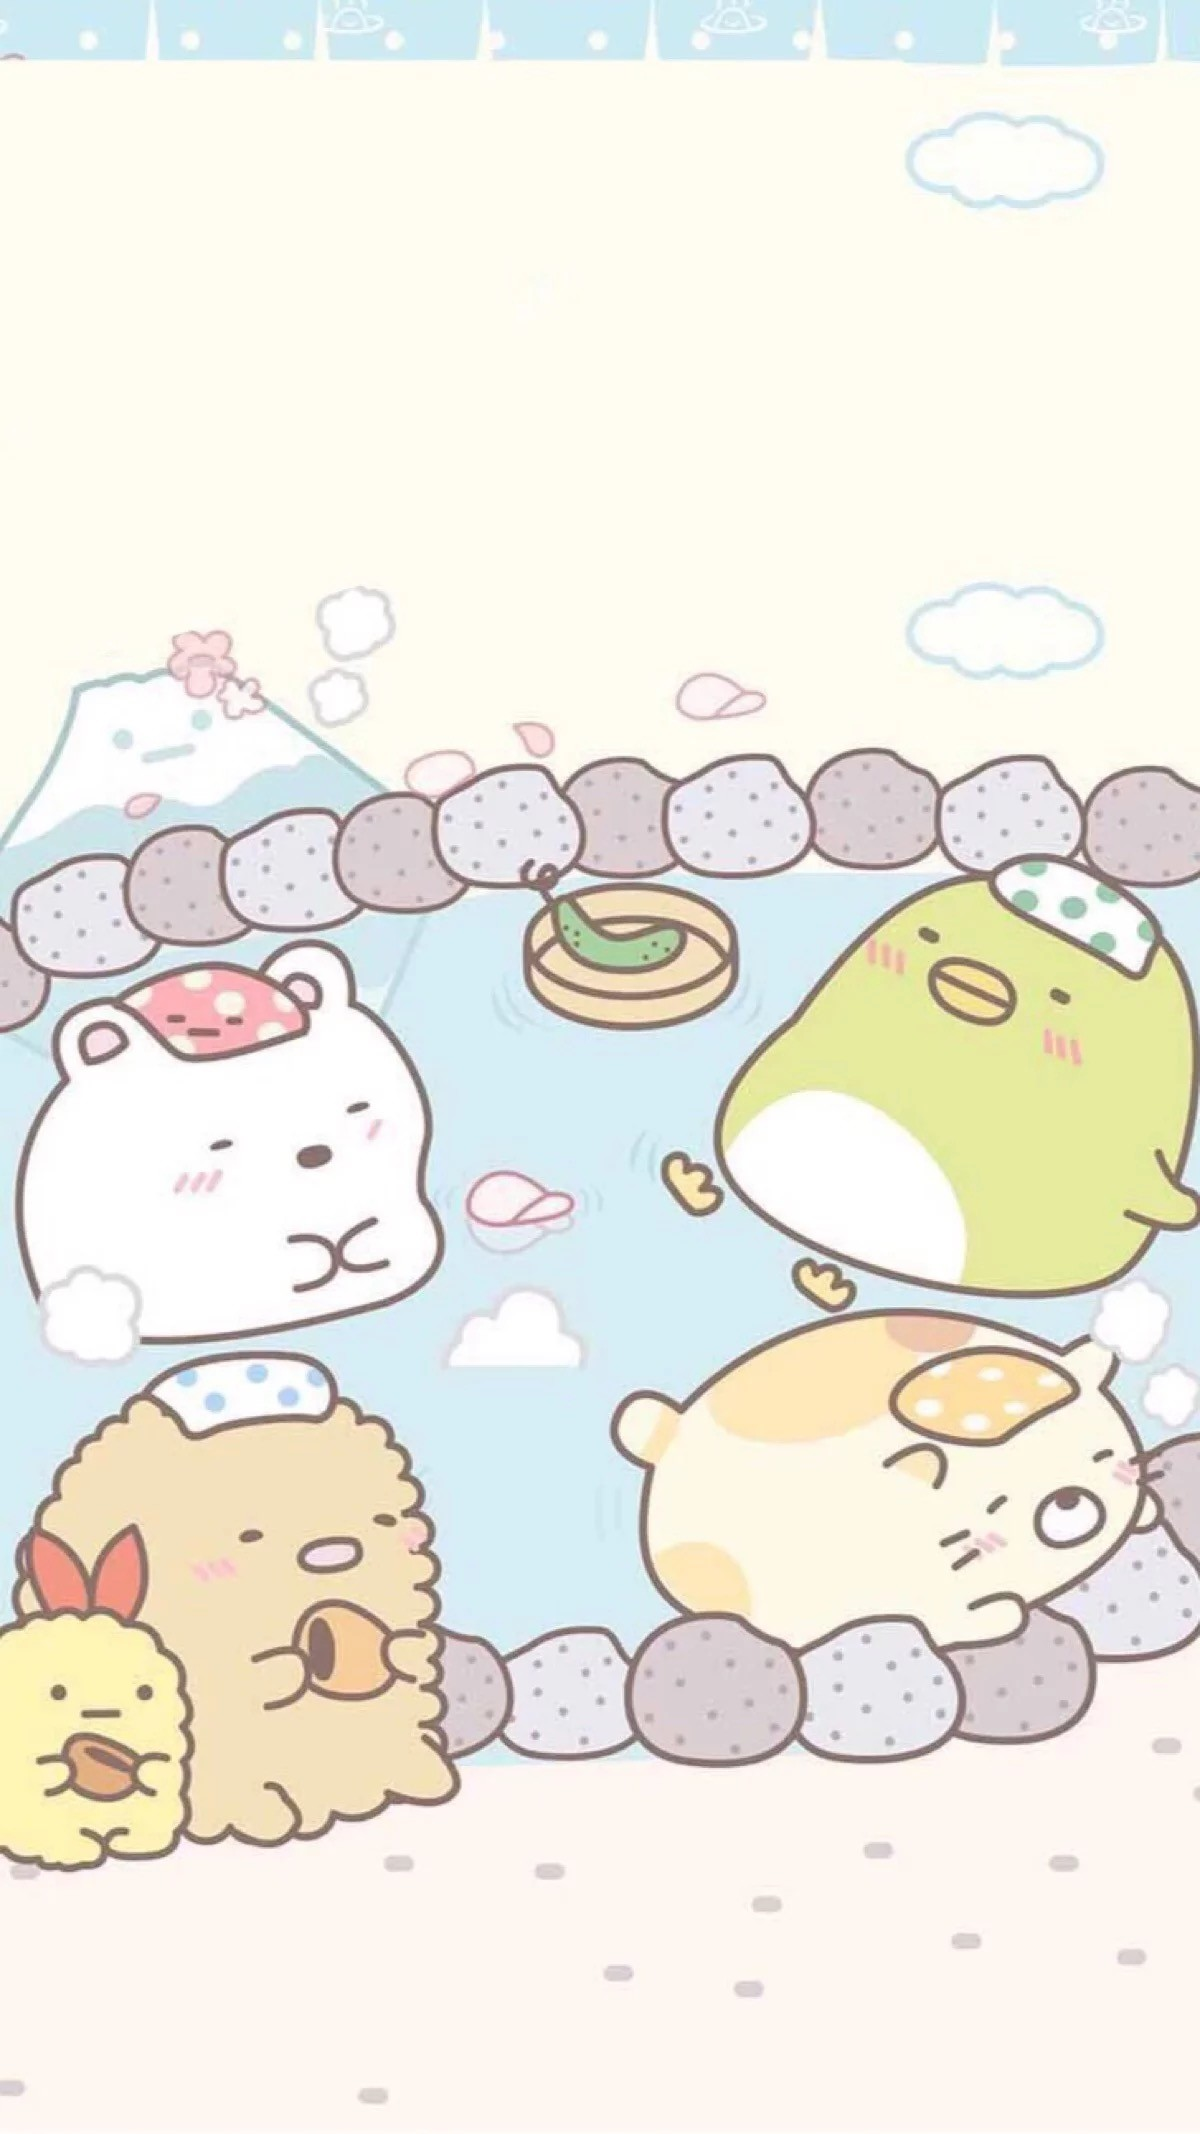 Wallpaper Keroppi Cute Badtz Maru Wallpaper 50 Images